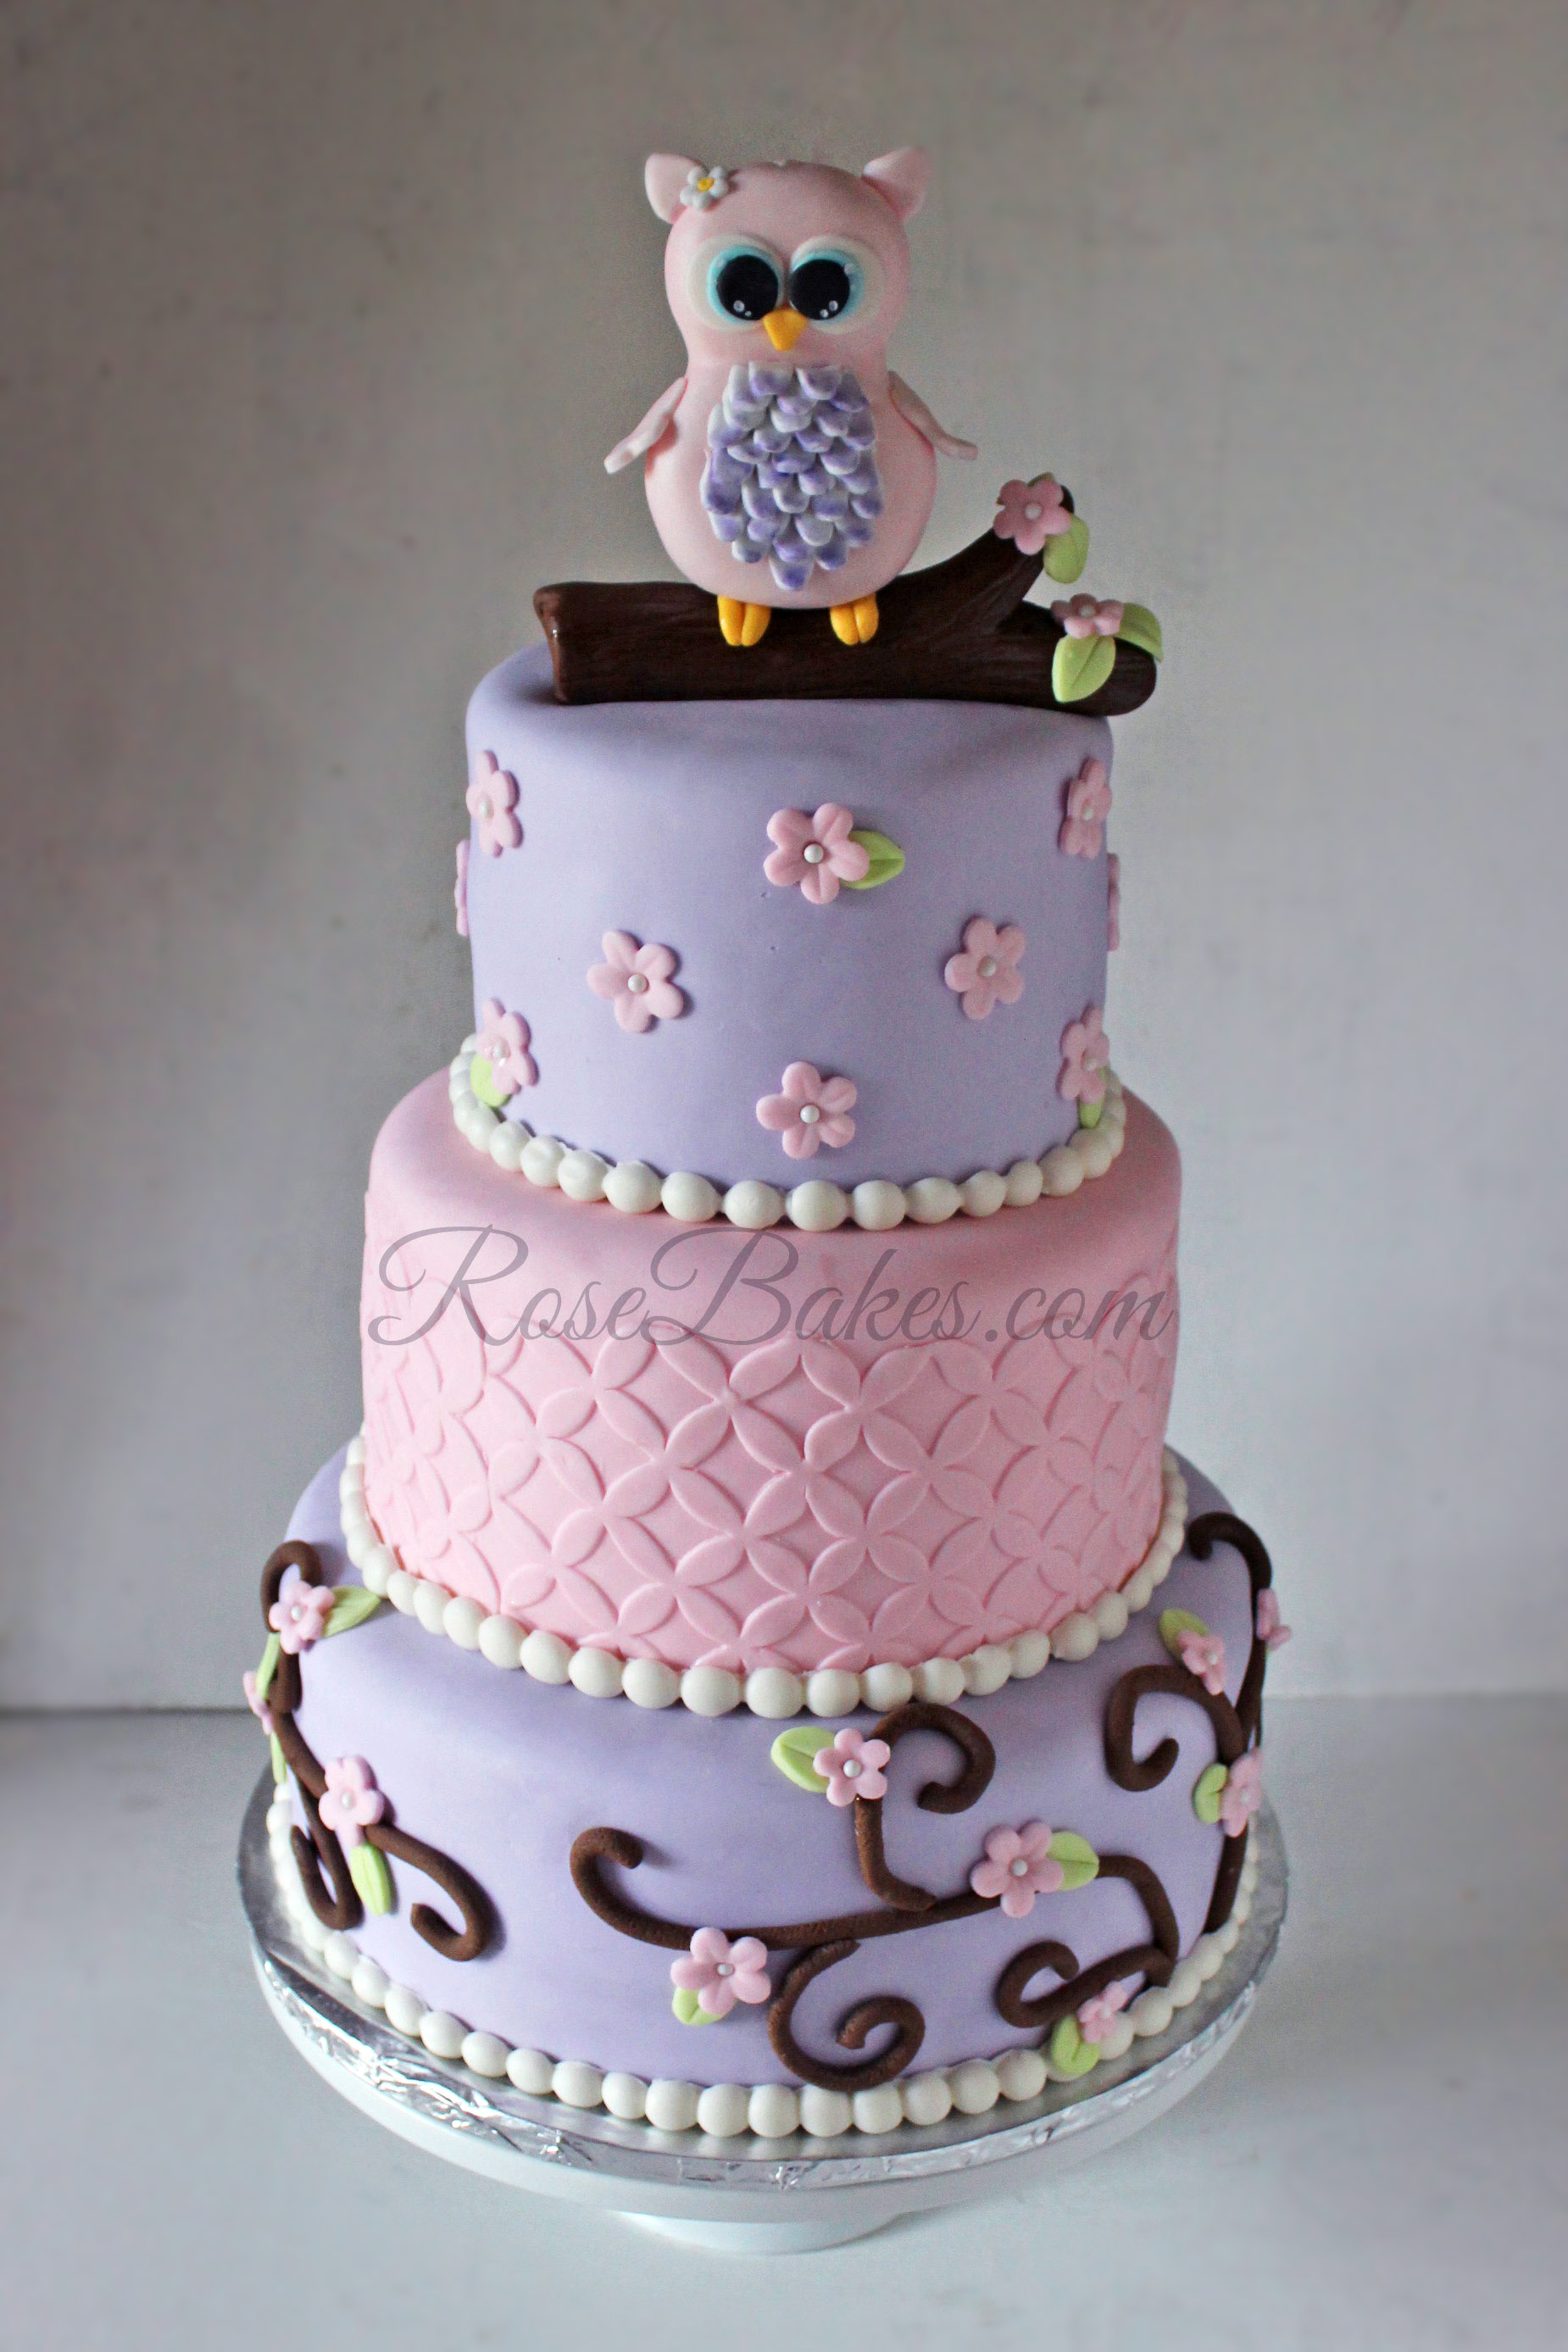 Cake Baby Shower Owl : Pink Owl Baby Shower Cake - Rose Bakes